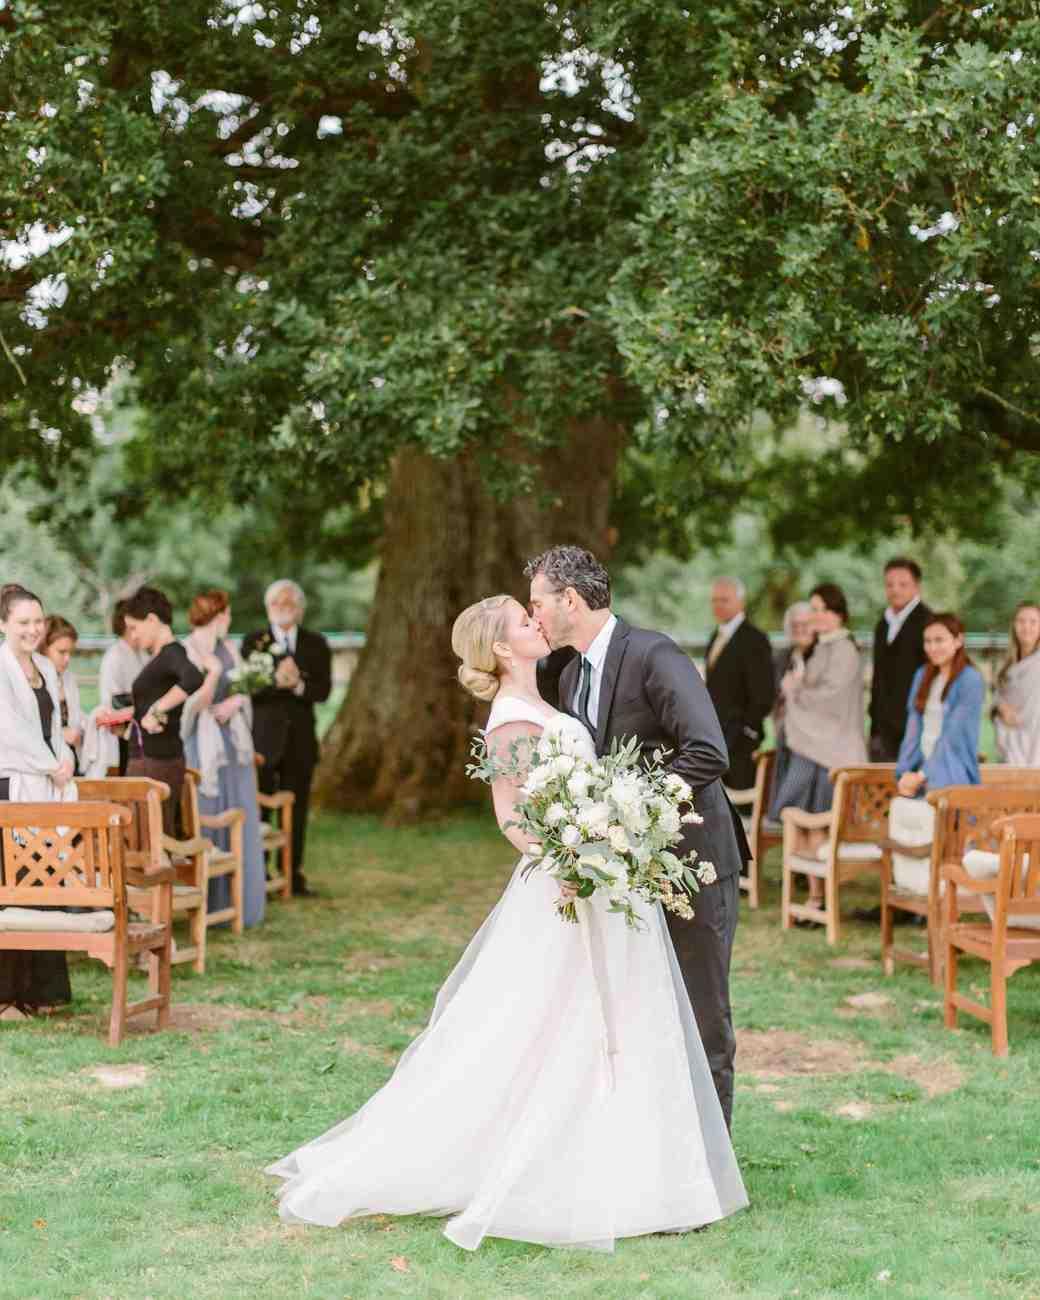 anneclaire-chris-wedding-france-kiss-032-s113034-00716.jpg